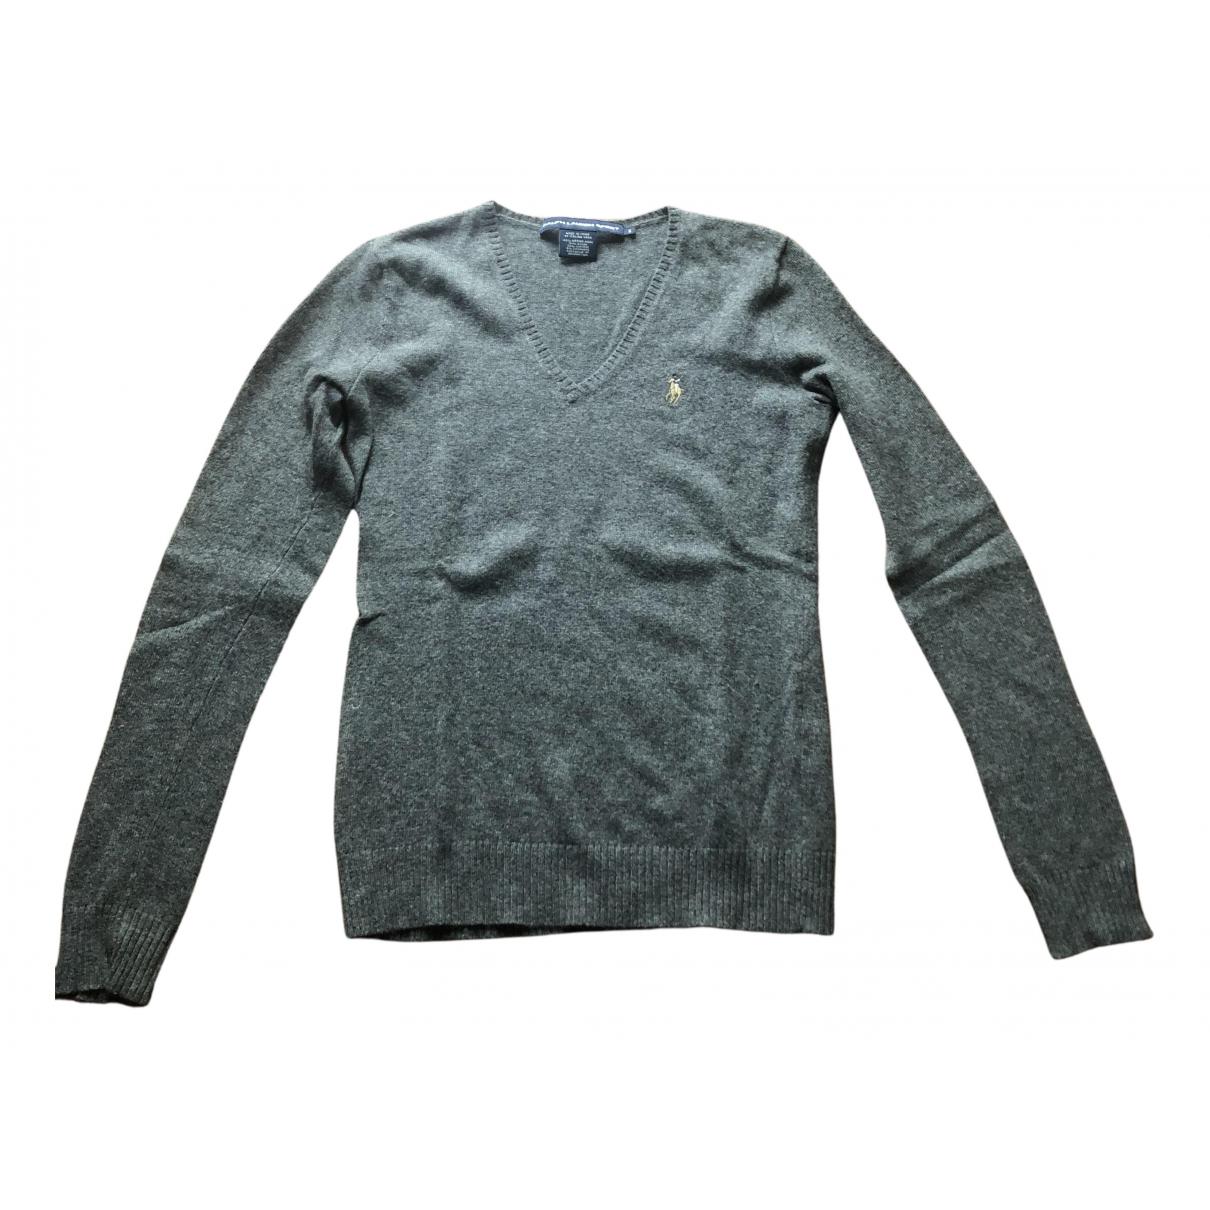 Ralph Lauren N Grey Cotton Knitwear for Women S International